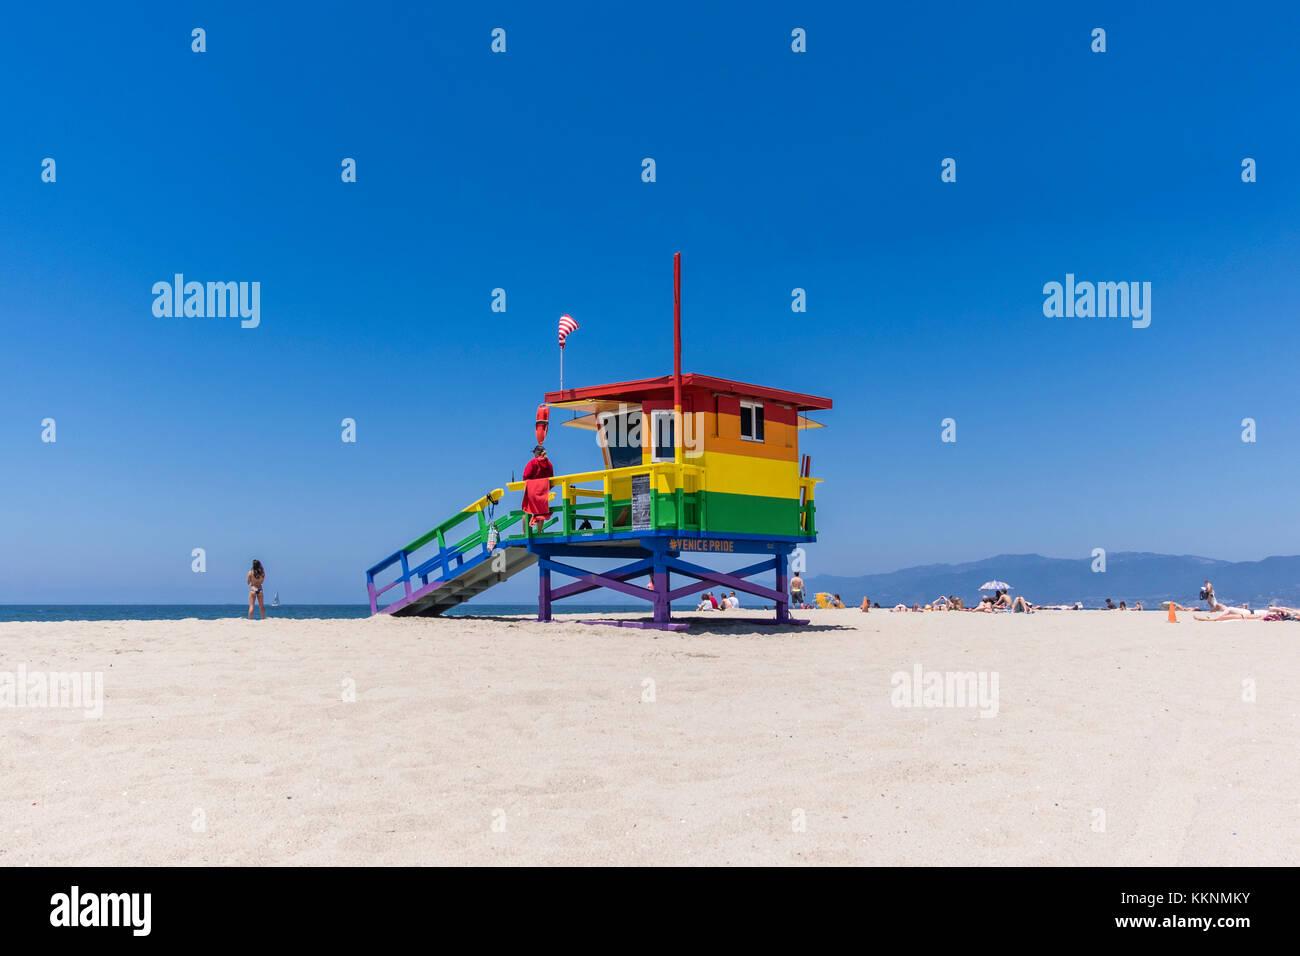 Lifeguard Tower with Rainbow colors, Venice Beach, Los Angeles, California, USA - Stock Image